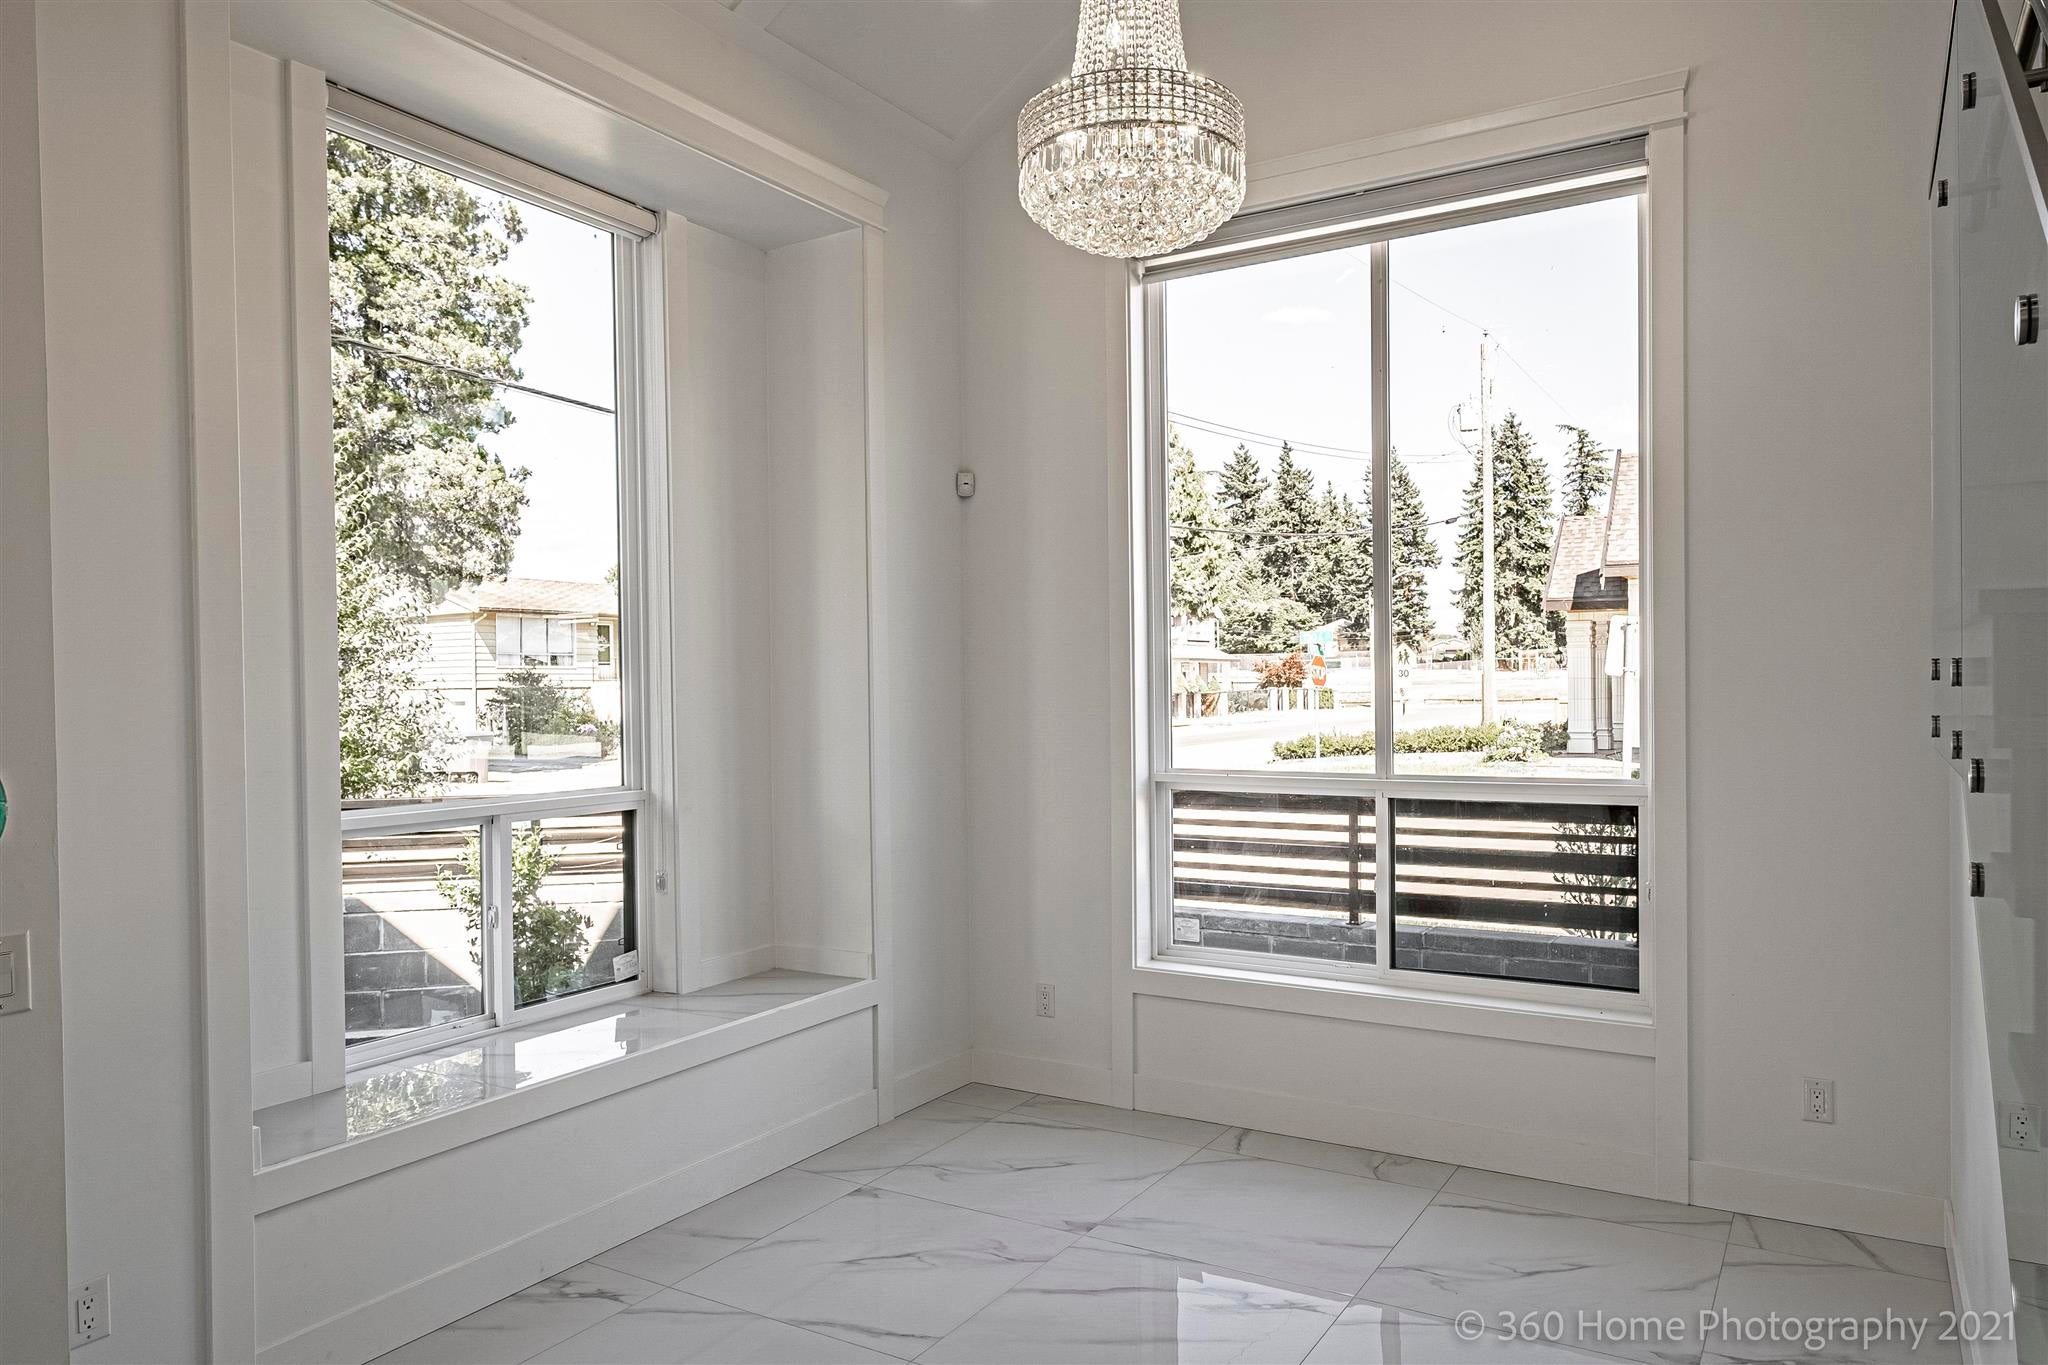 13050 101B AVENUE - Cedar Hills House/Single Family for sale, 5 Bedrooms (R2602208) - #7